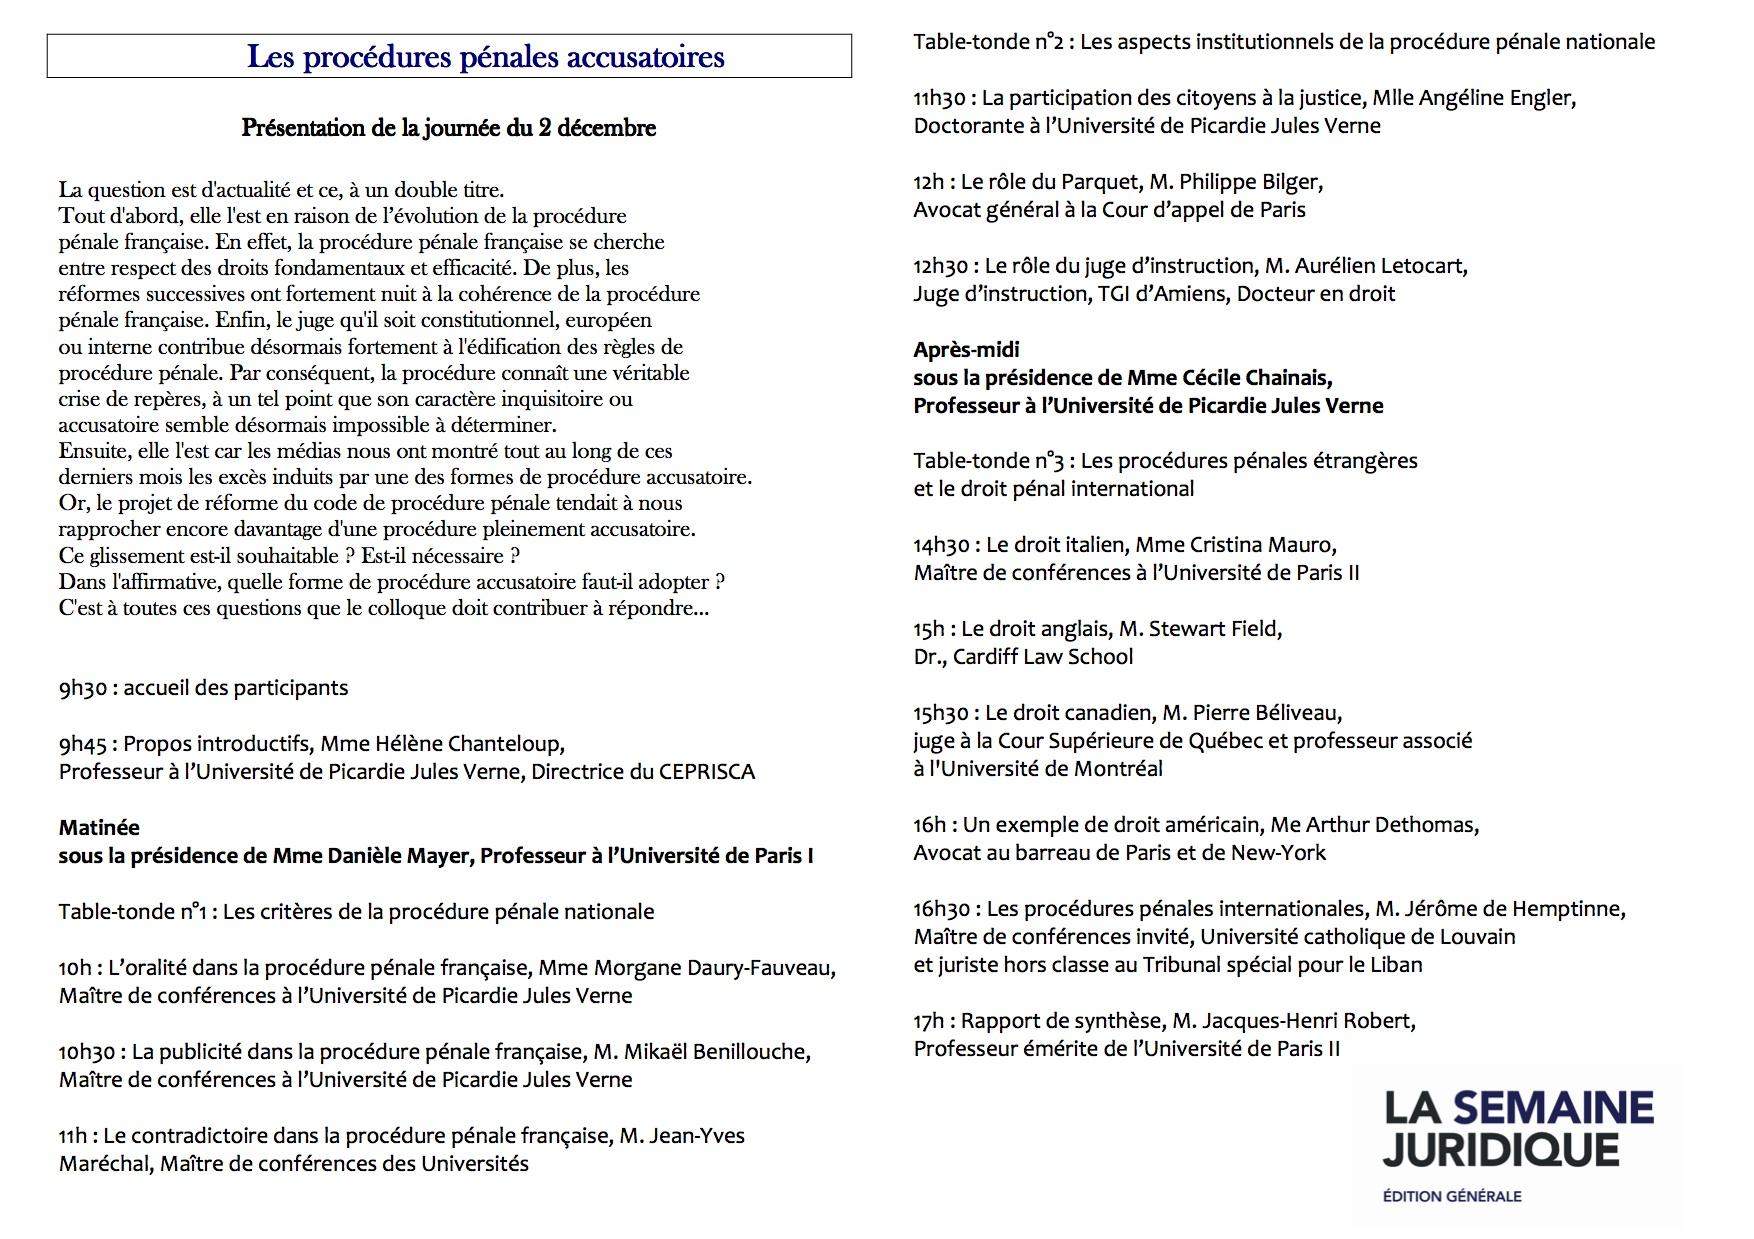 PROGRAMME-_CEPRISCA-_procedures_penales_accusatoires_-_2-12-2011